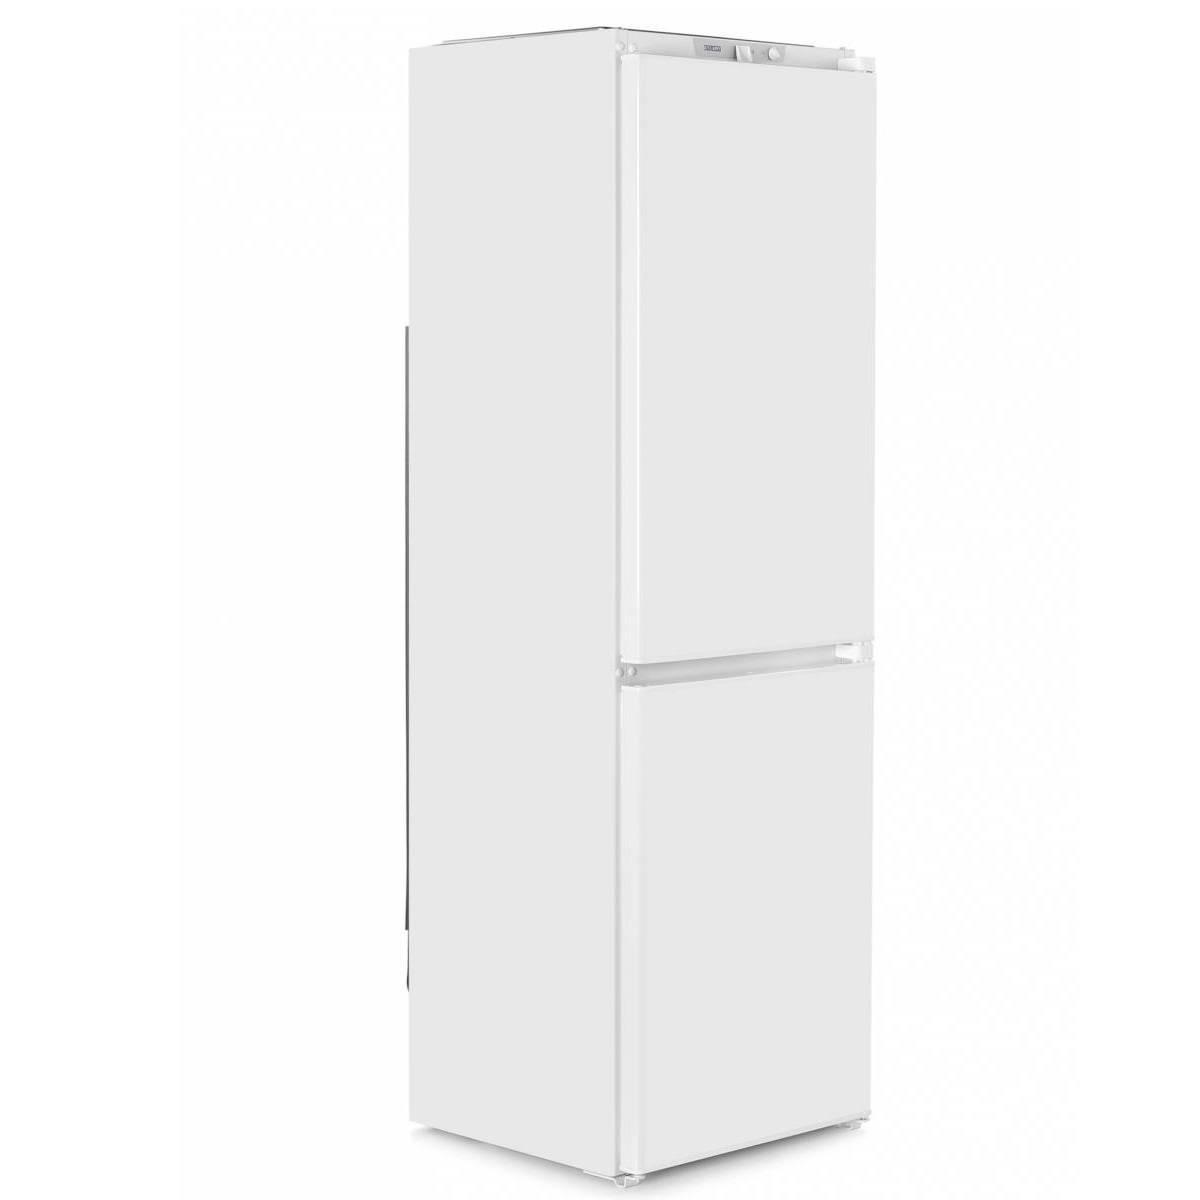 Холодильник goldstar gr 462fdc